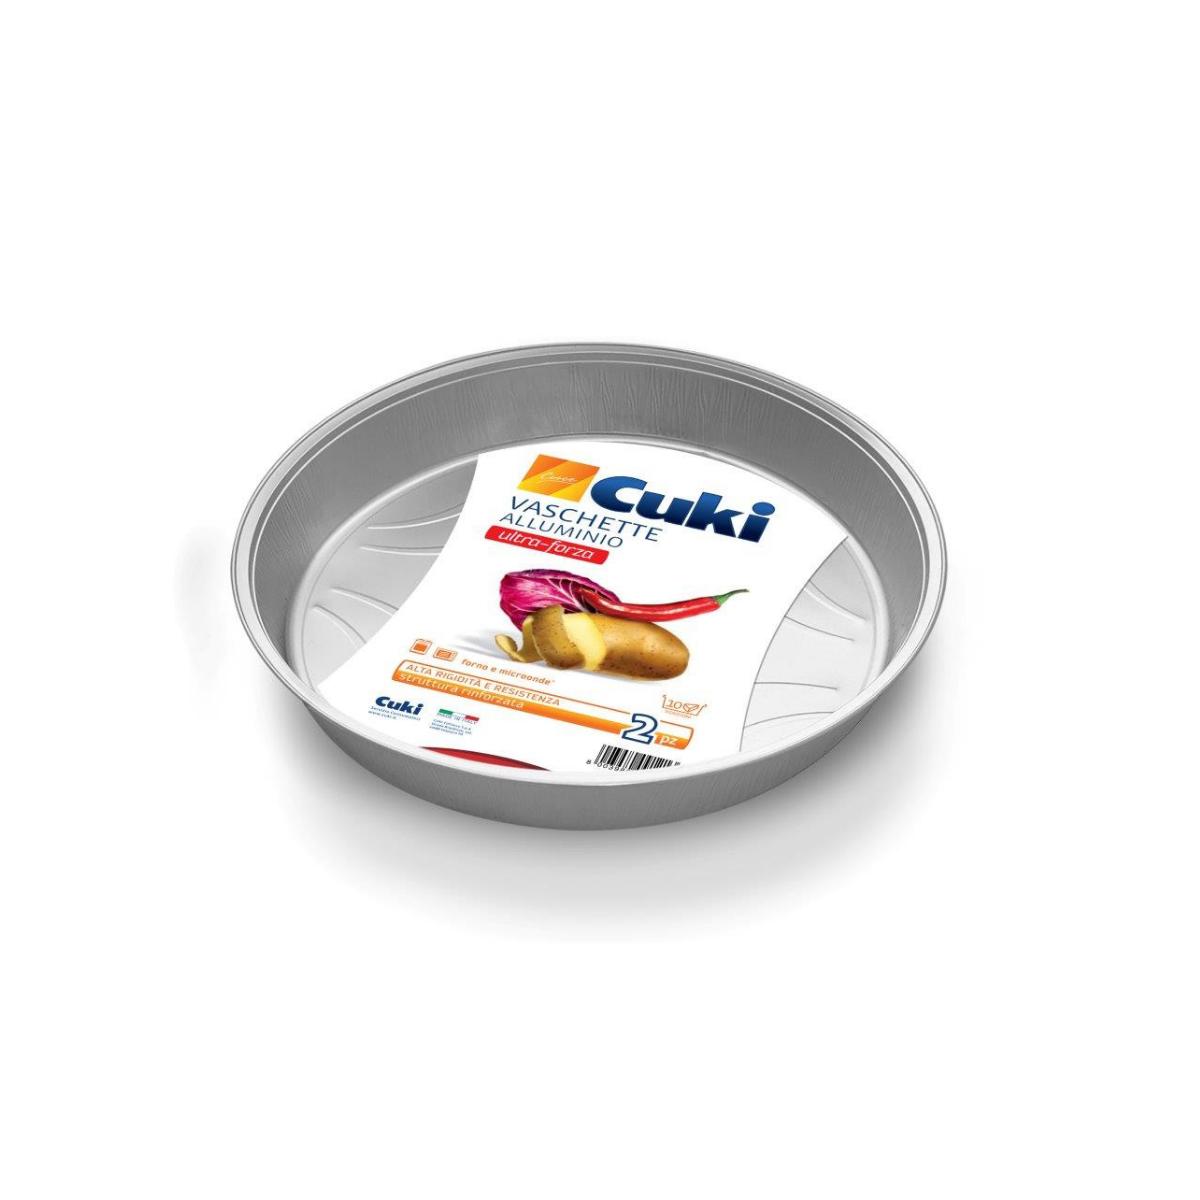 vaschetta alluminio cuki rotonda cod 315183